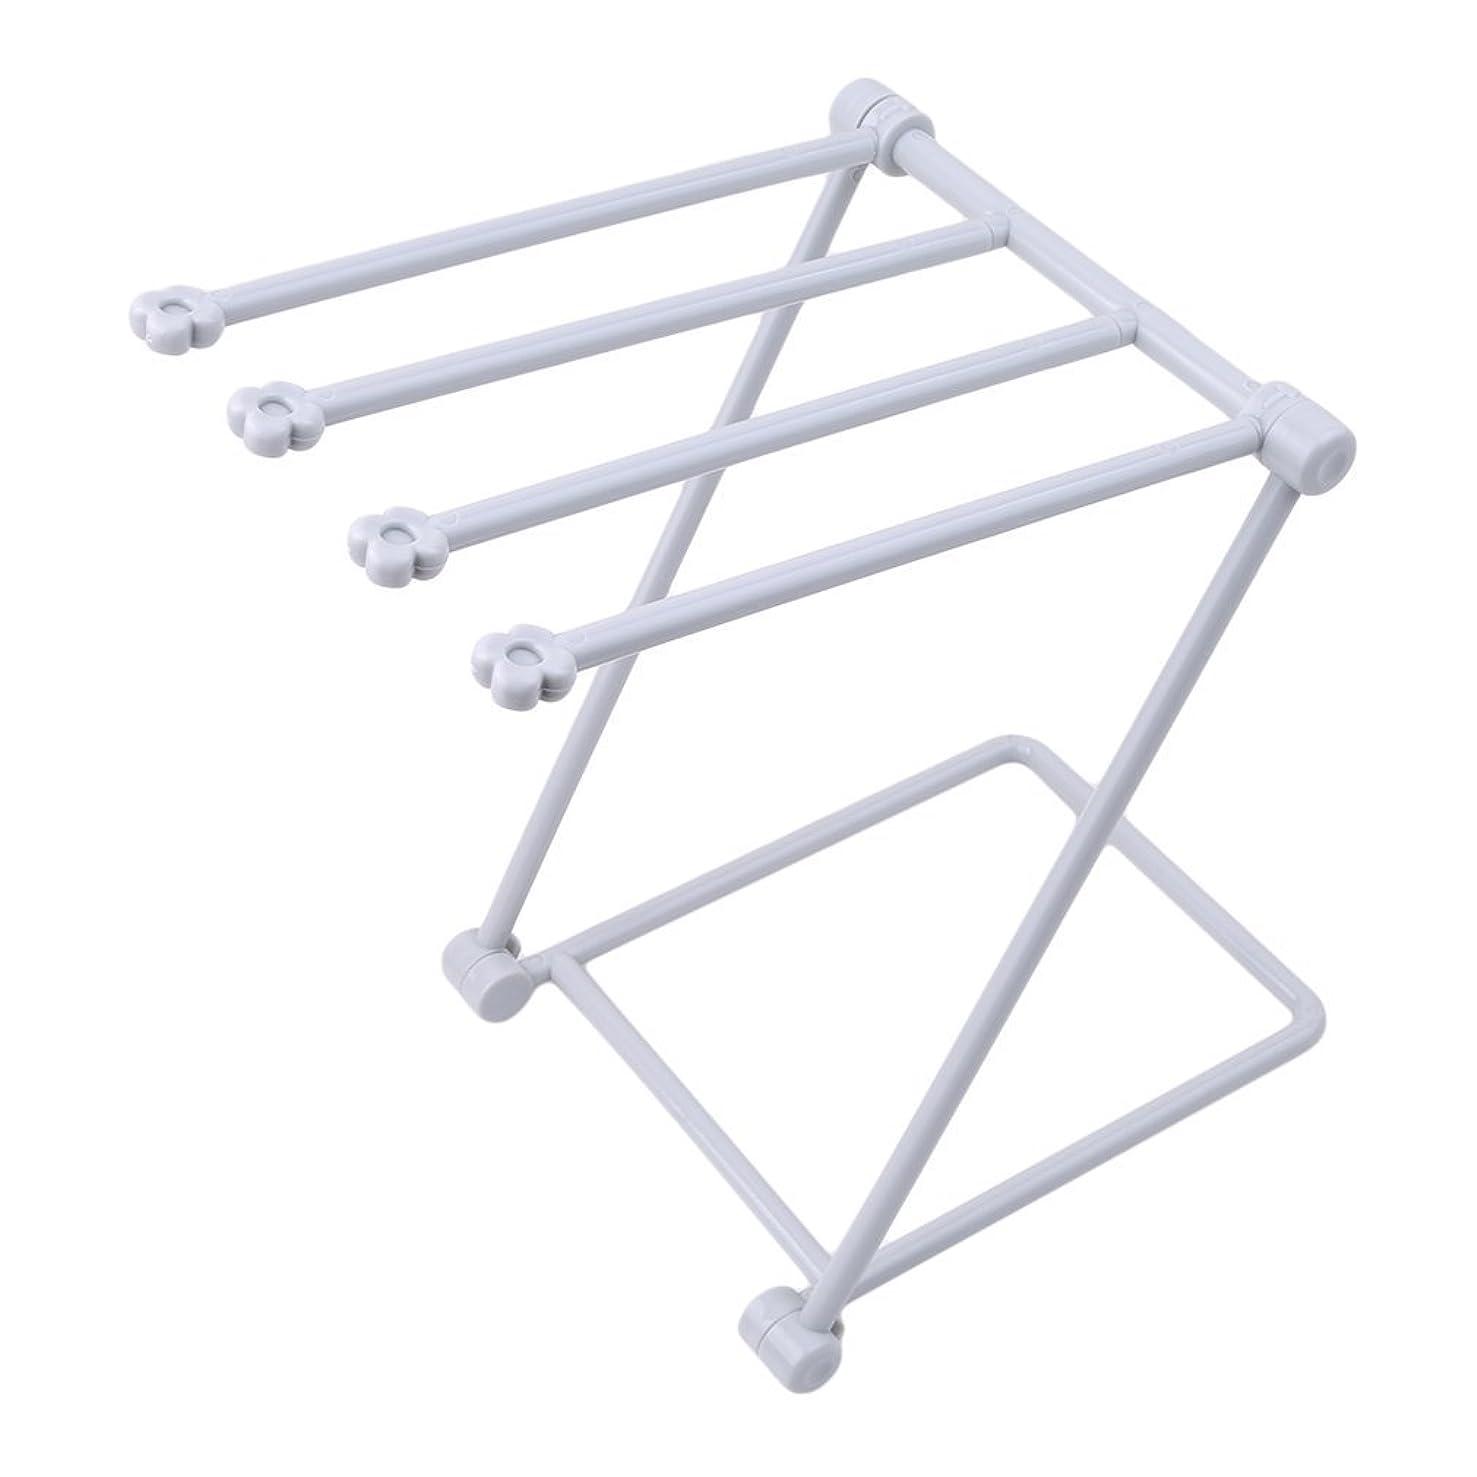 SAVORLIVING Drying Rack Collapsible Kitchen Rags Rack Multi-Purpose Desktop Glass Holder Folding Dishcloth Storage Stand with 4 Hanging Rails for Kitchen Bathroom (Grey)